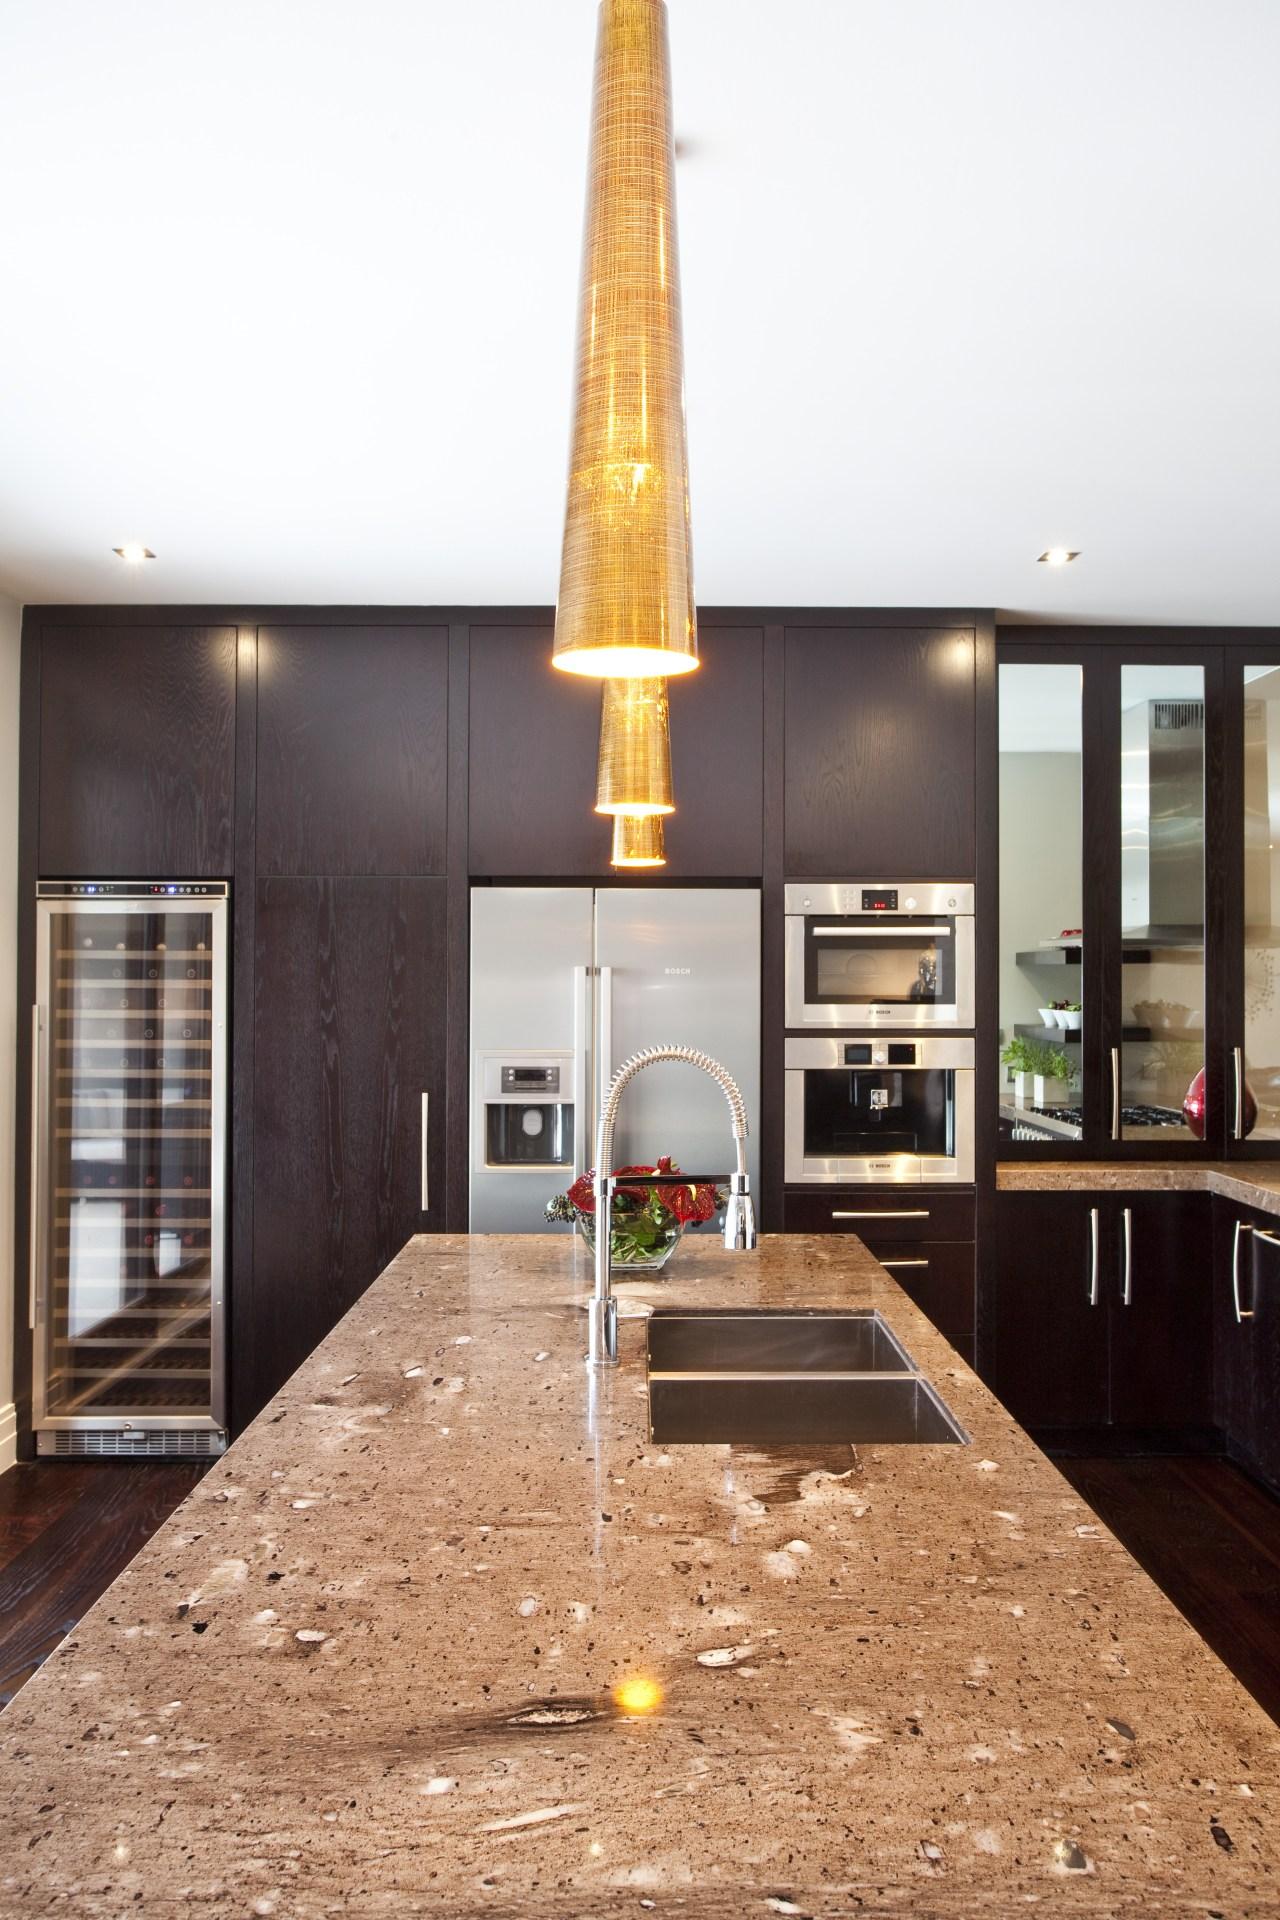 Balinese design influence. Dark-roasted American oak floorboards. Mousse house, interior design, white